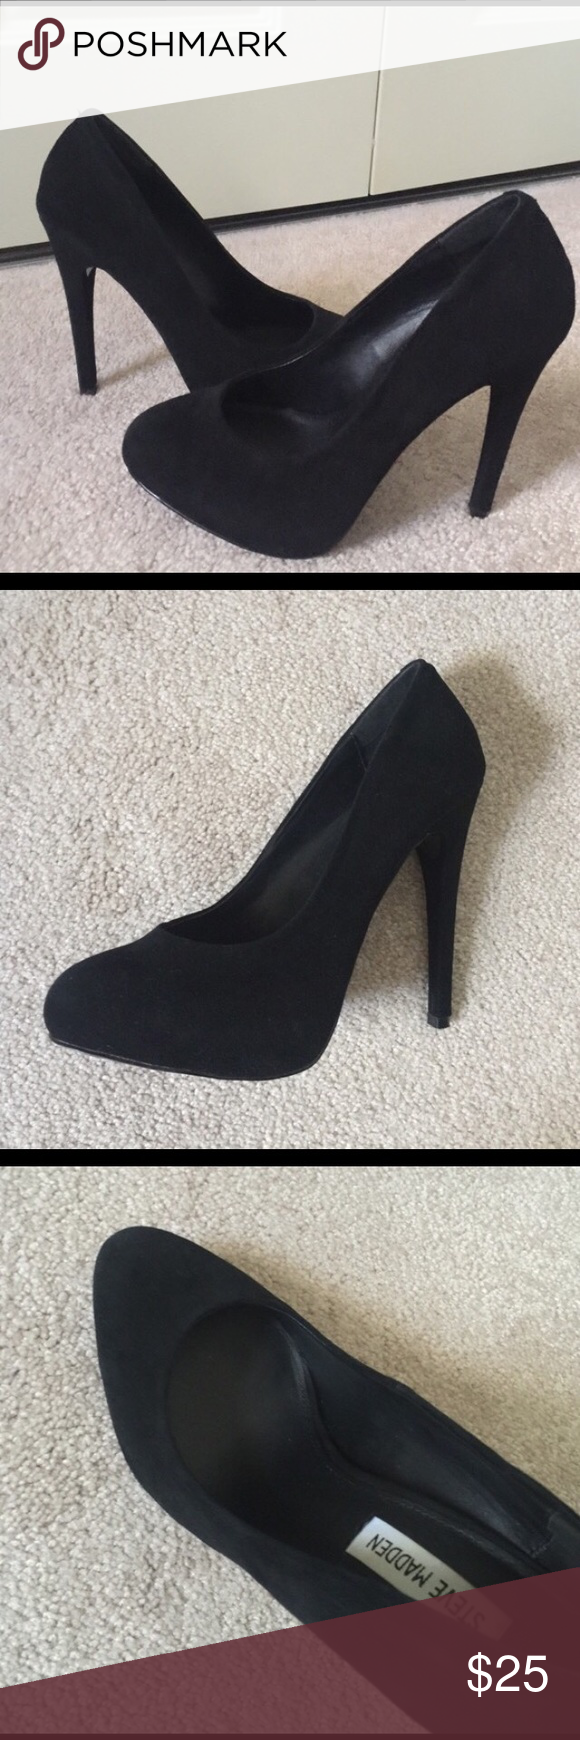 Black Suede Heels Black Steve Madden Suede Heels. Round toe. Great Condition! Steve Madden Shoes Heels